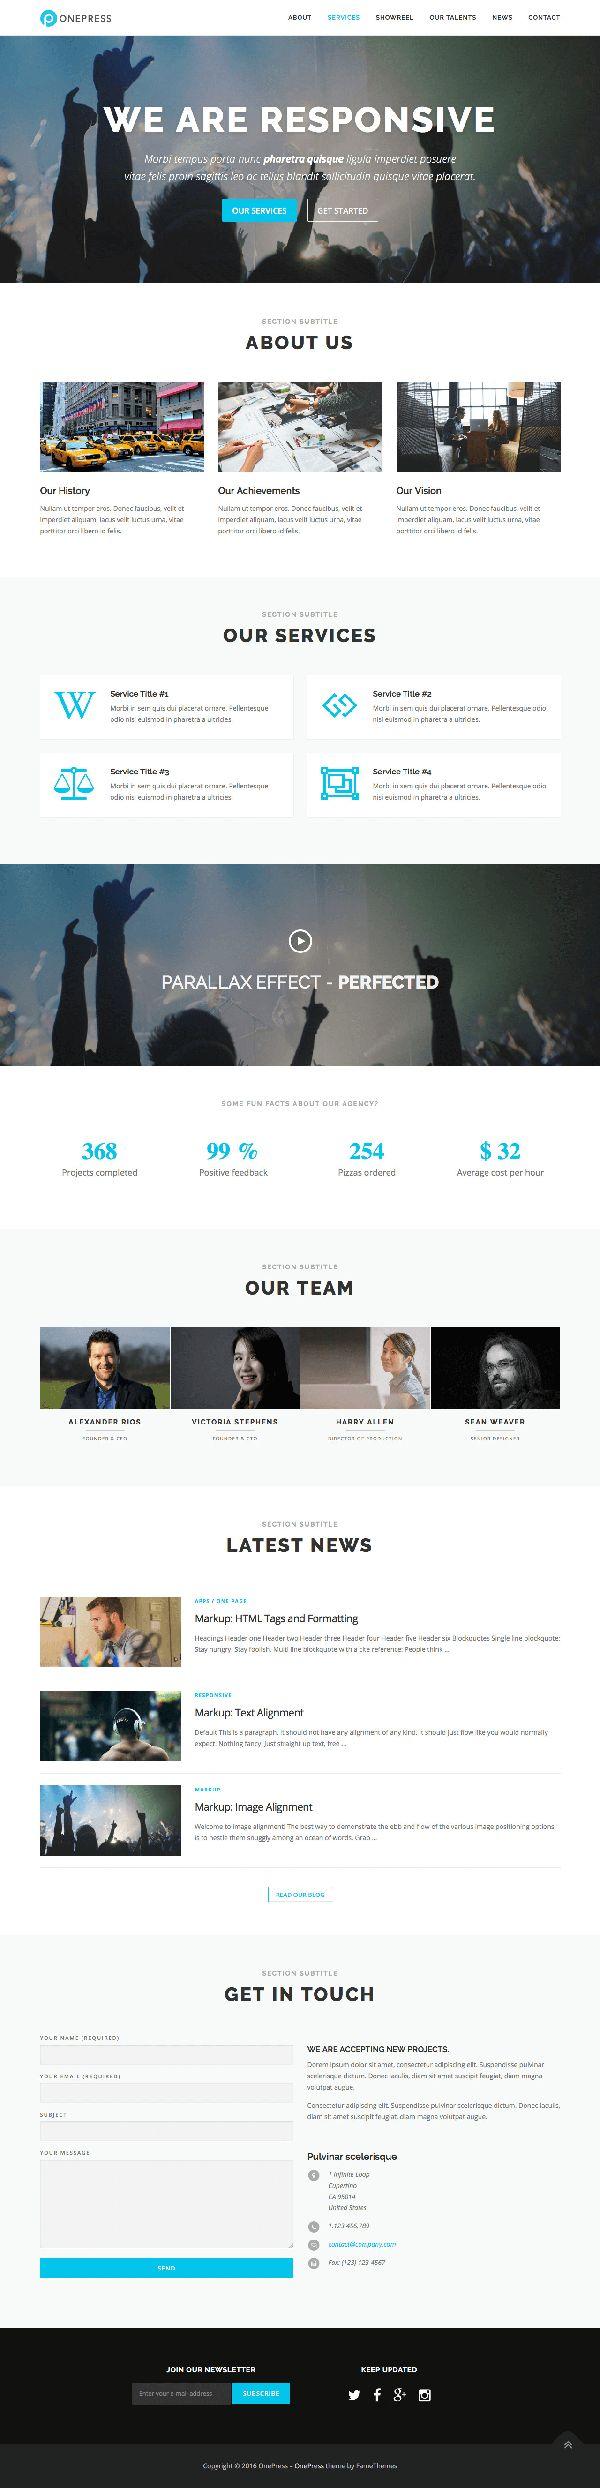 OnePress : One Page WordPress Theme - Free Download